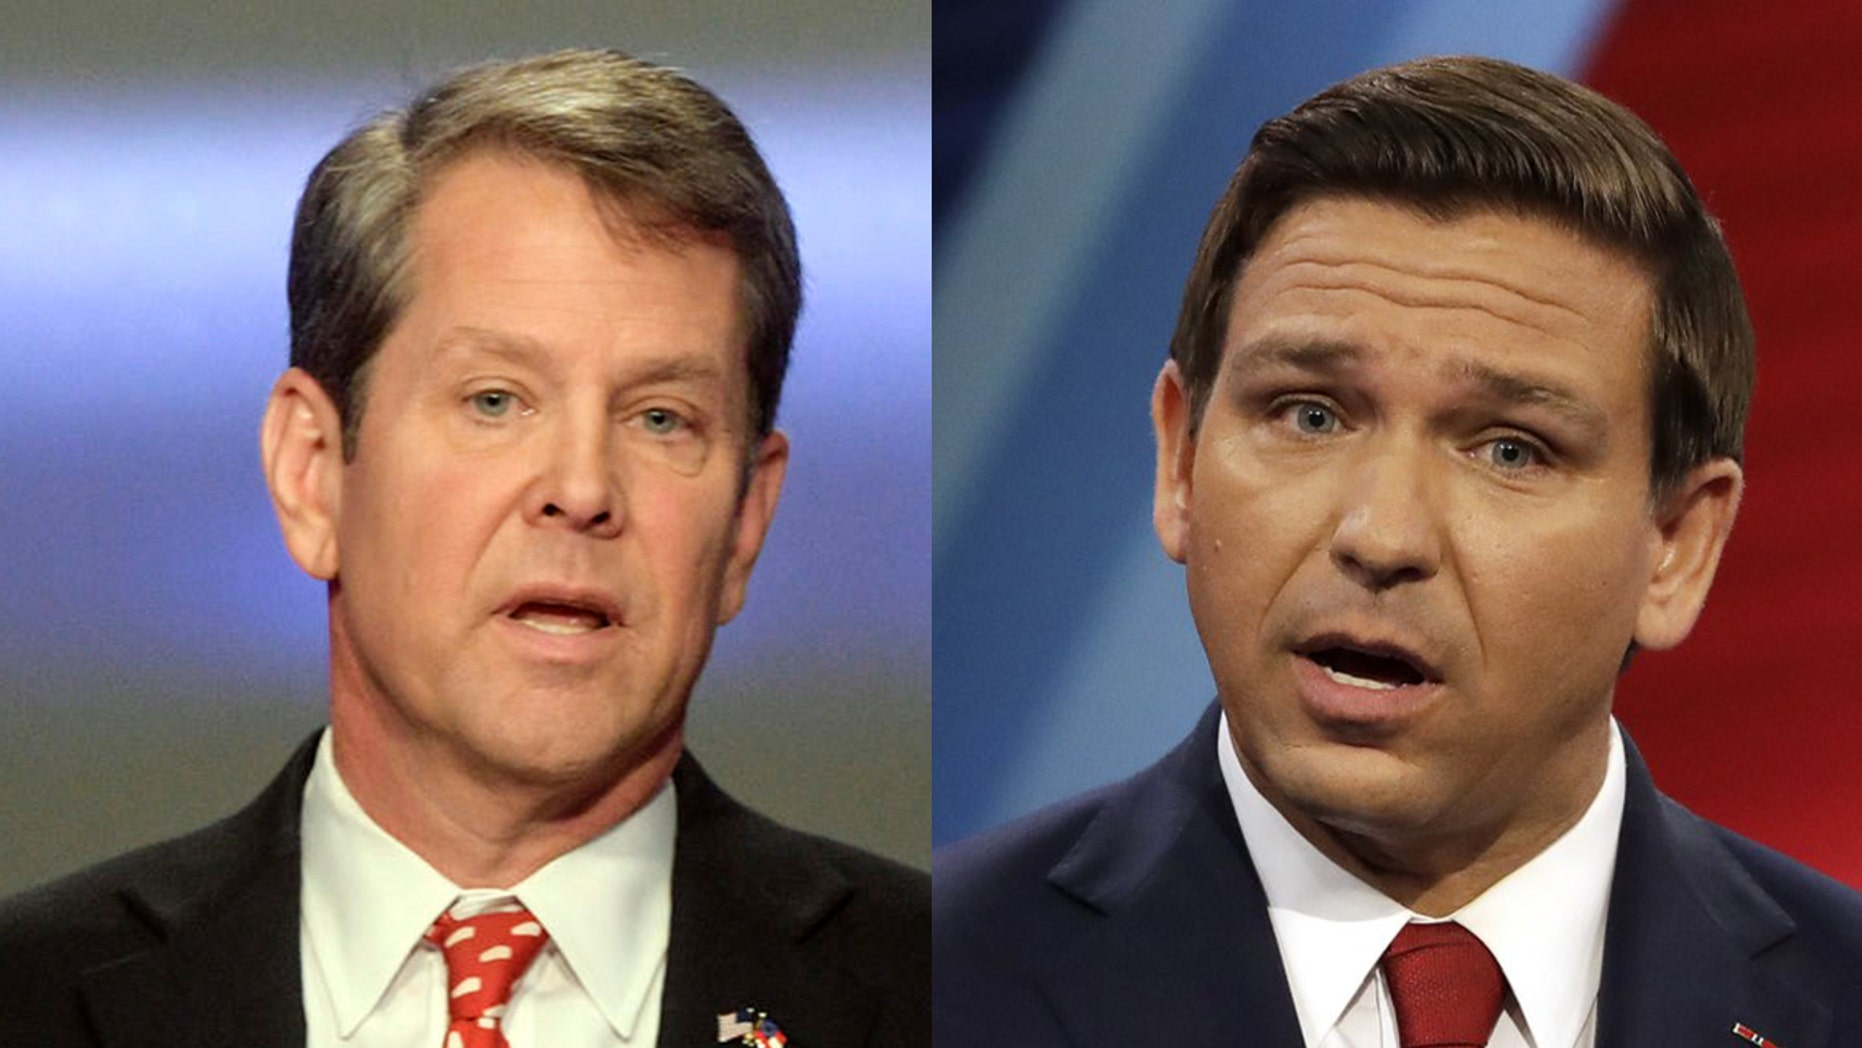 Georgia Republican Brian Kemp and Florida Republican Ron DeSantis both look certain to win their gubernatorial races. (AP)<br>